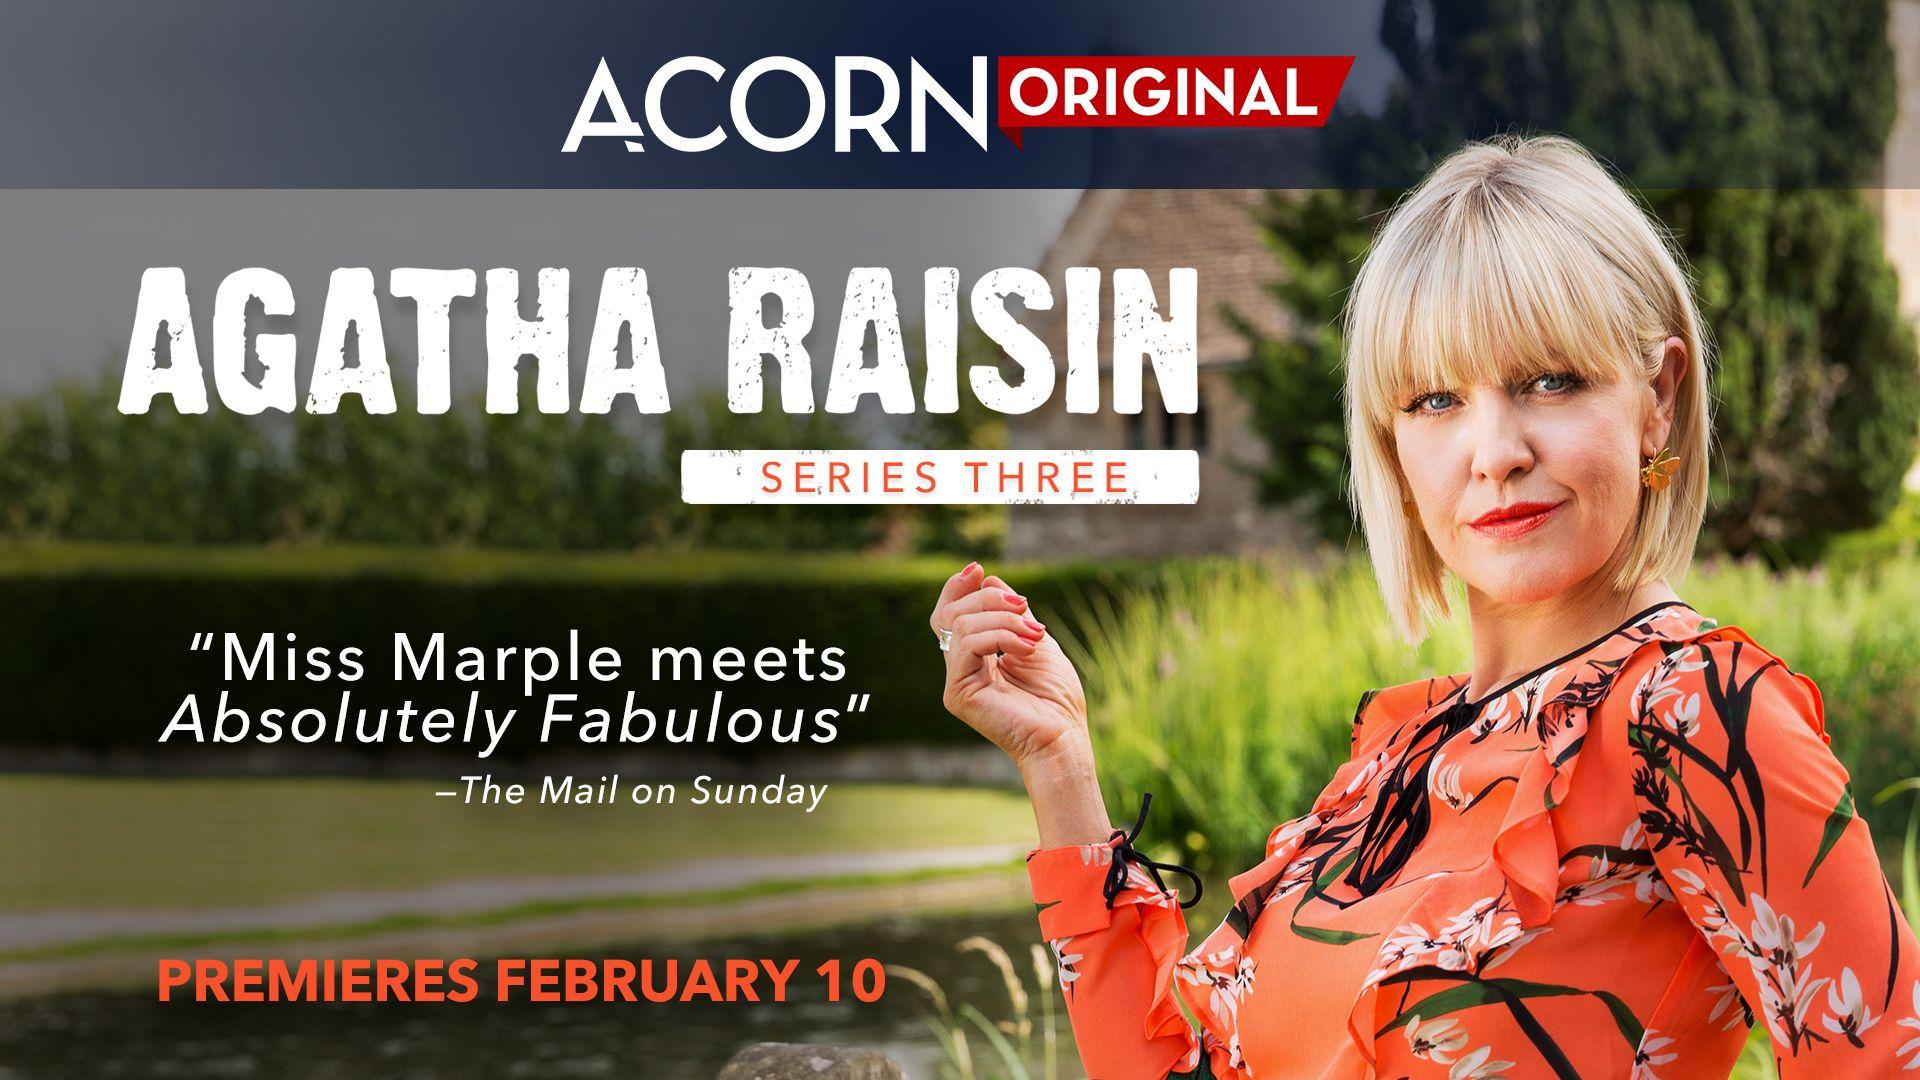 Watch Agatha Raisin On In 2020 Agatha Raisin Agatha Raisin Series